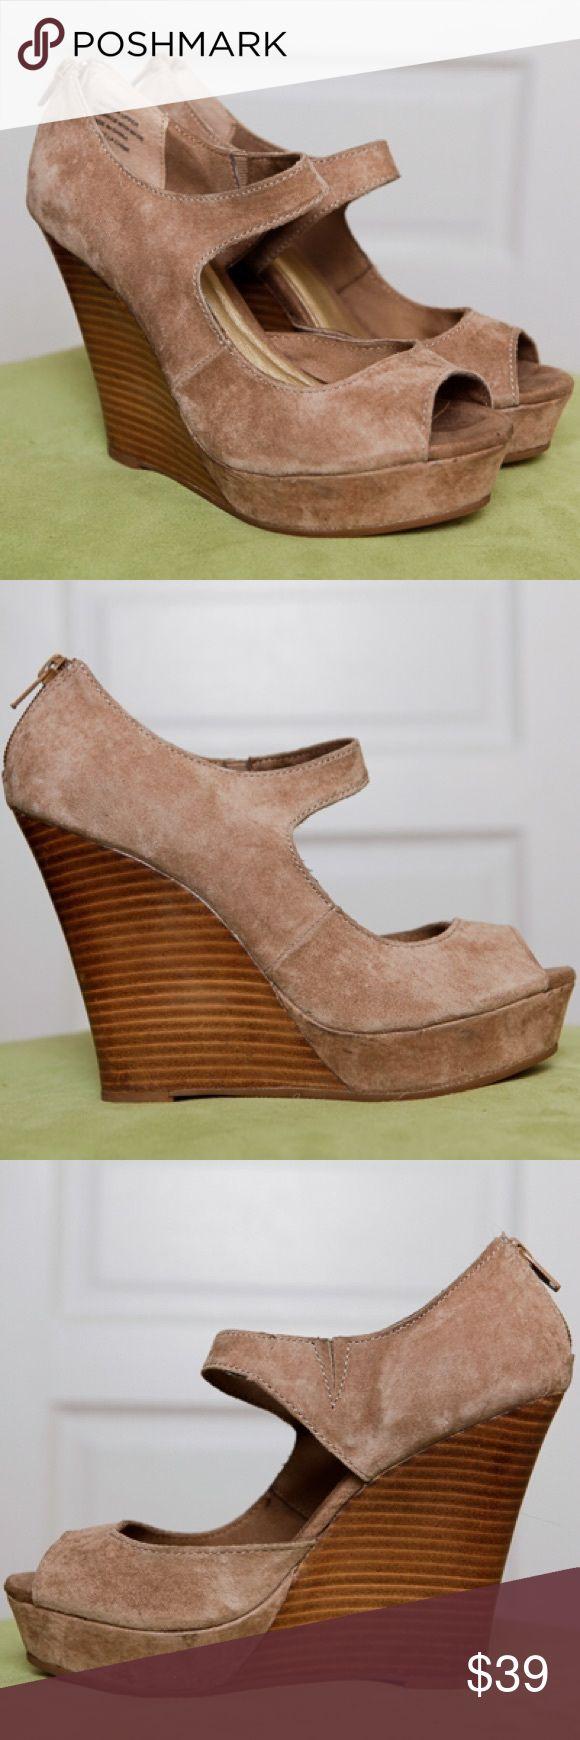 Seychelles Suede Wedges Seychelles Suede Tan Wedges. NWOT. Size 6. Seychelles Shoes Wedges